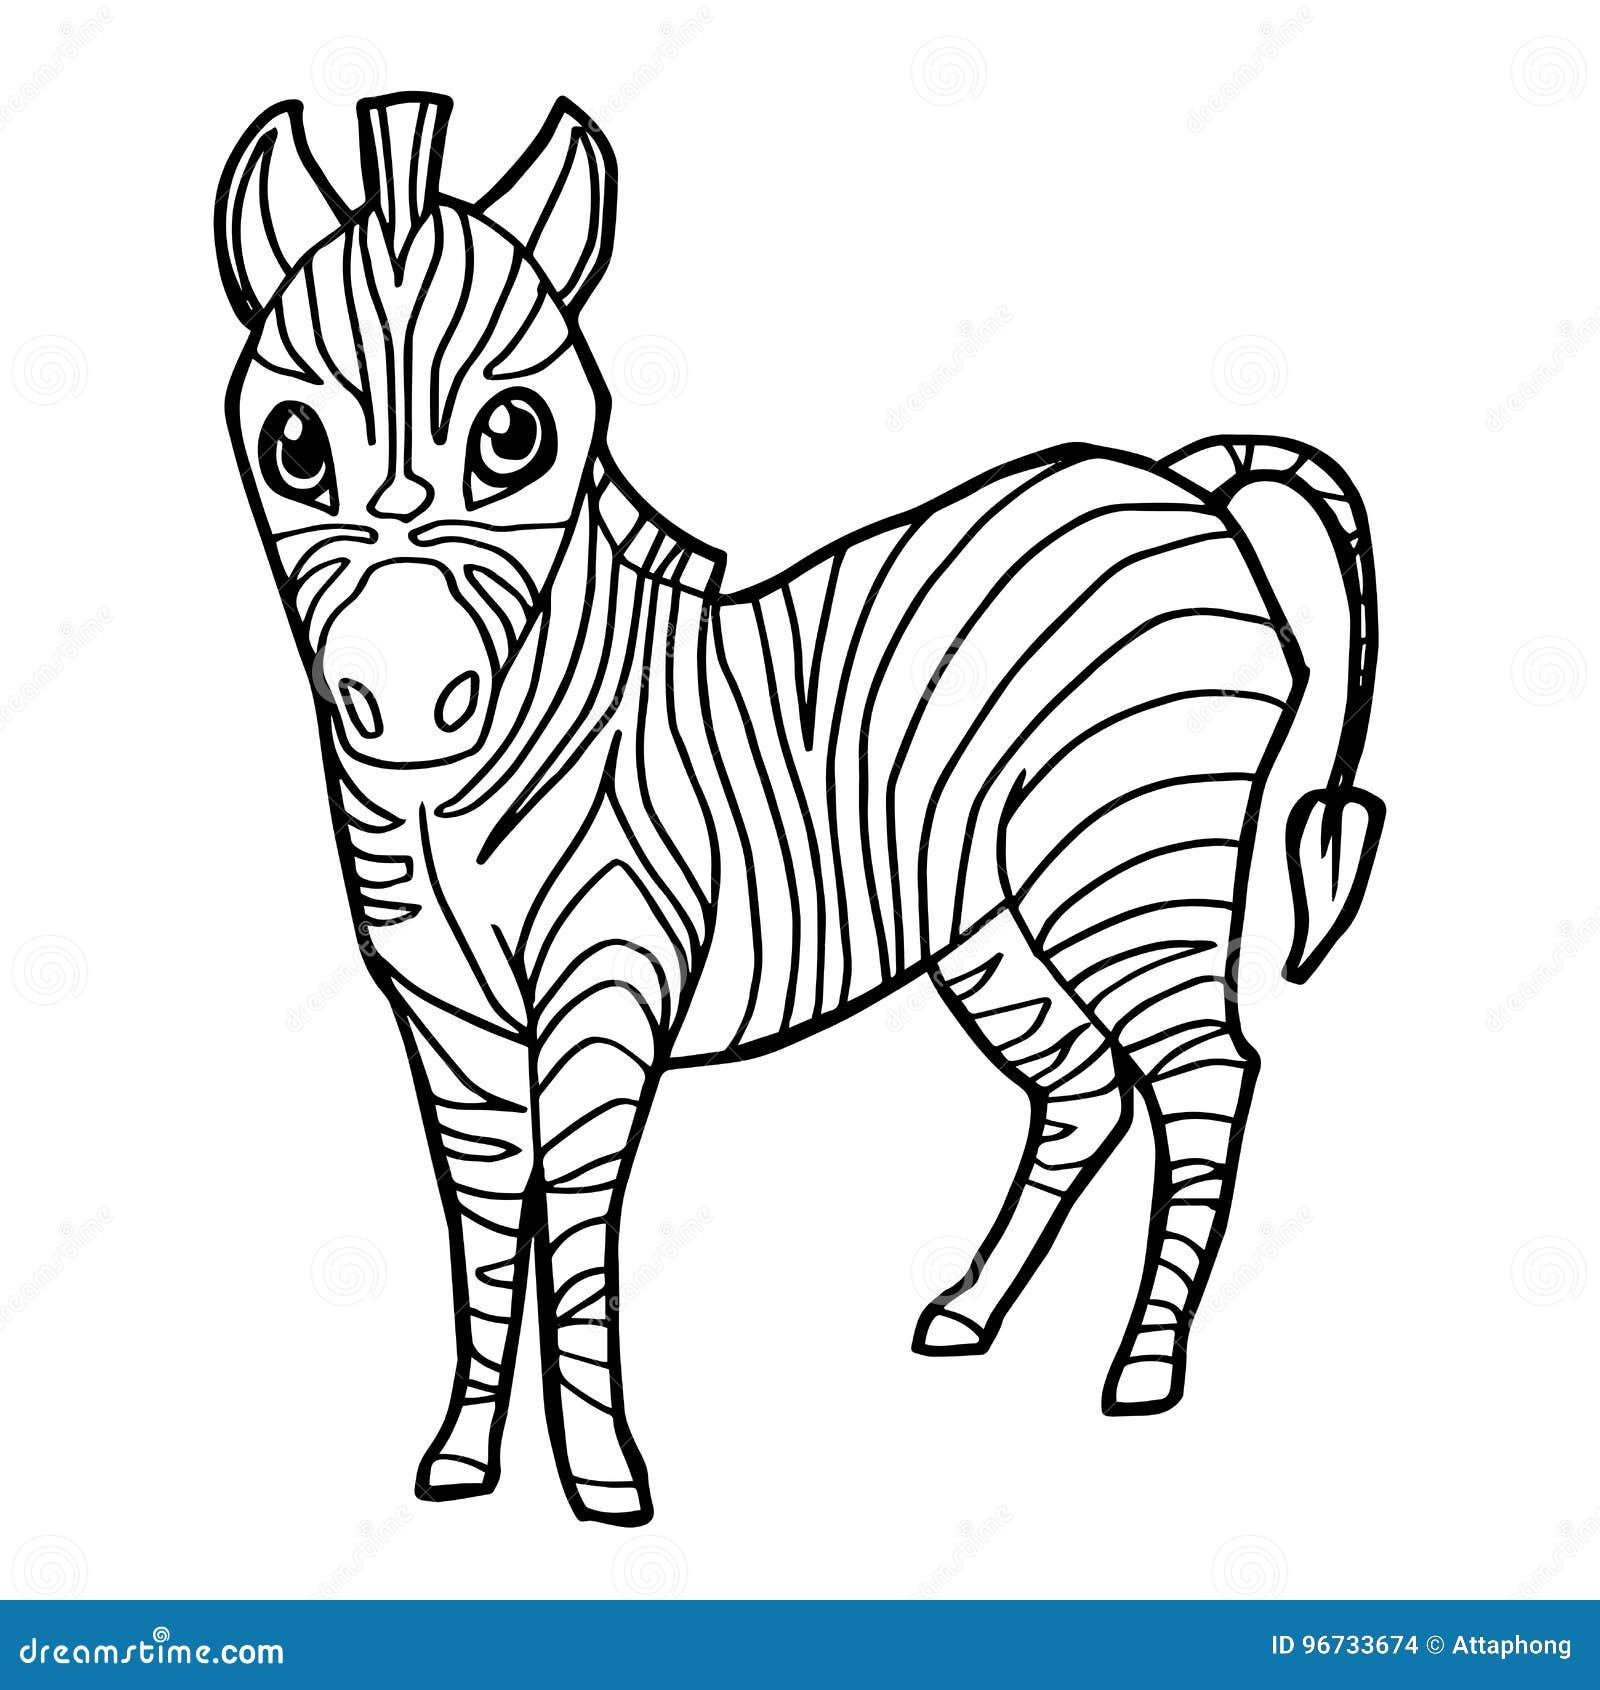 Download Cartoon Cute Zebra Coloring Page Vector Stock